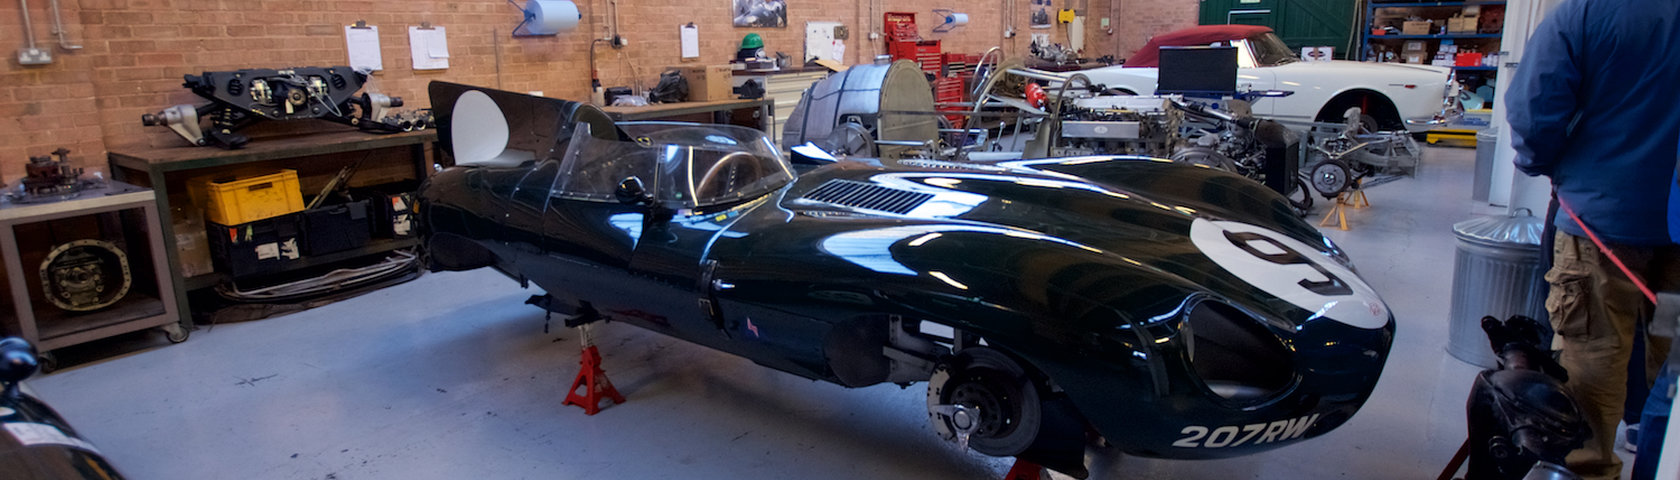 Nsh Jaguar Sunday Scramble 18